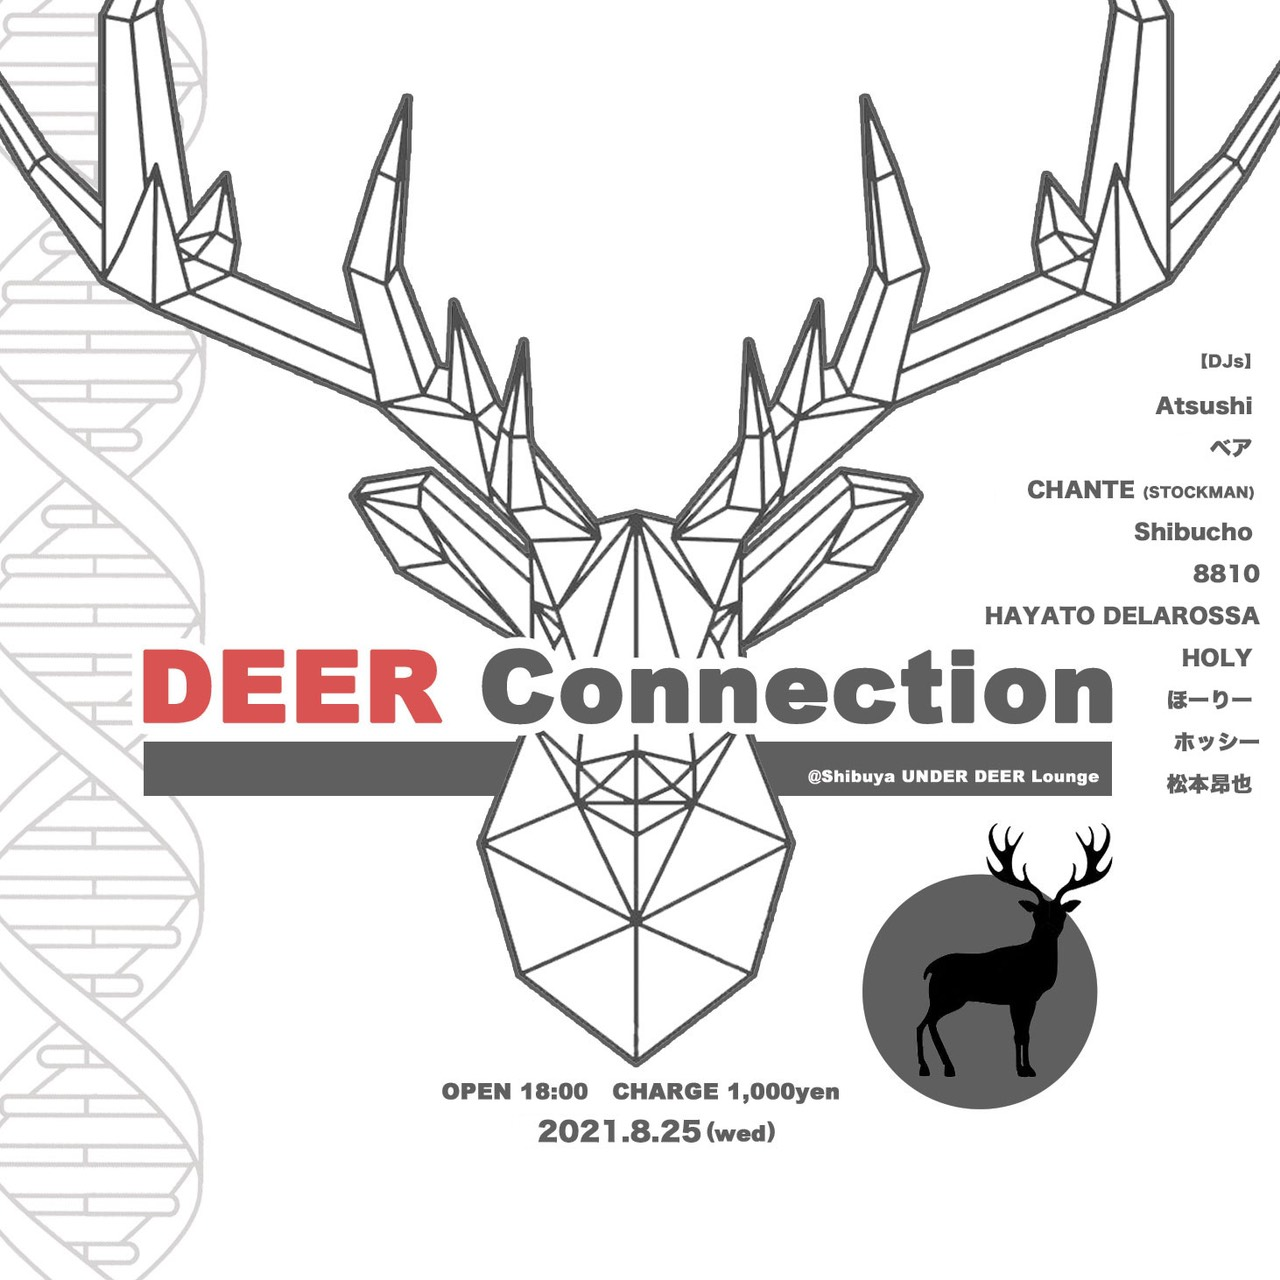 2021.8.25(wed) DEER Connection @渋谷UNDER DEER Lounge